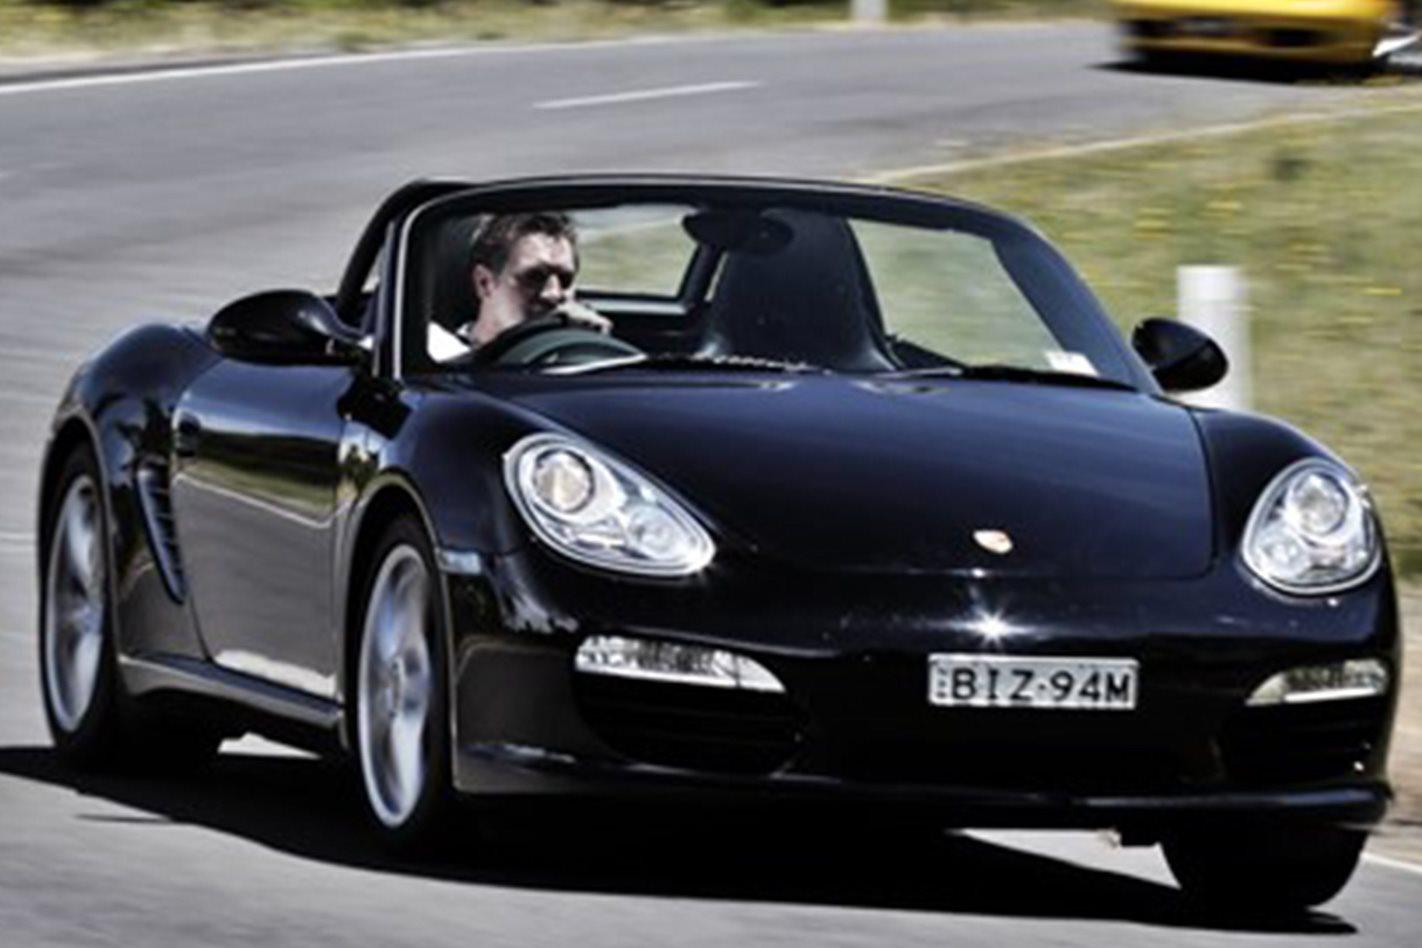 2009 Porsche Boxster front